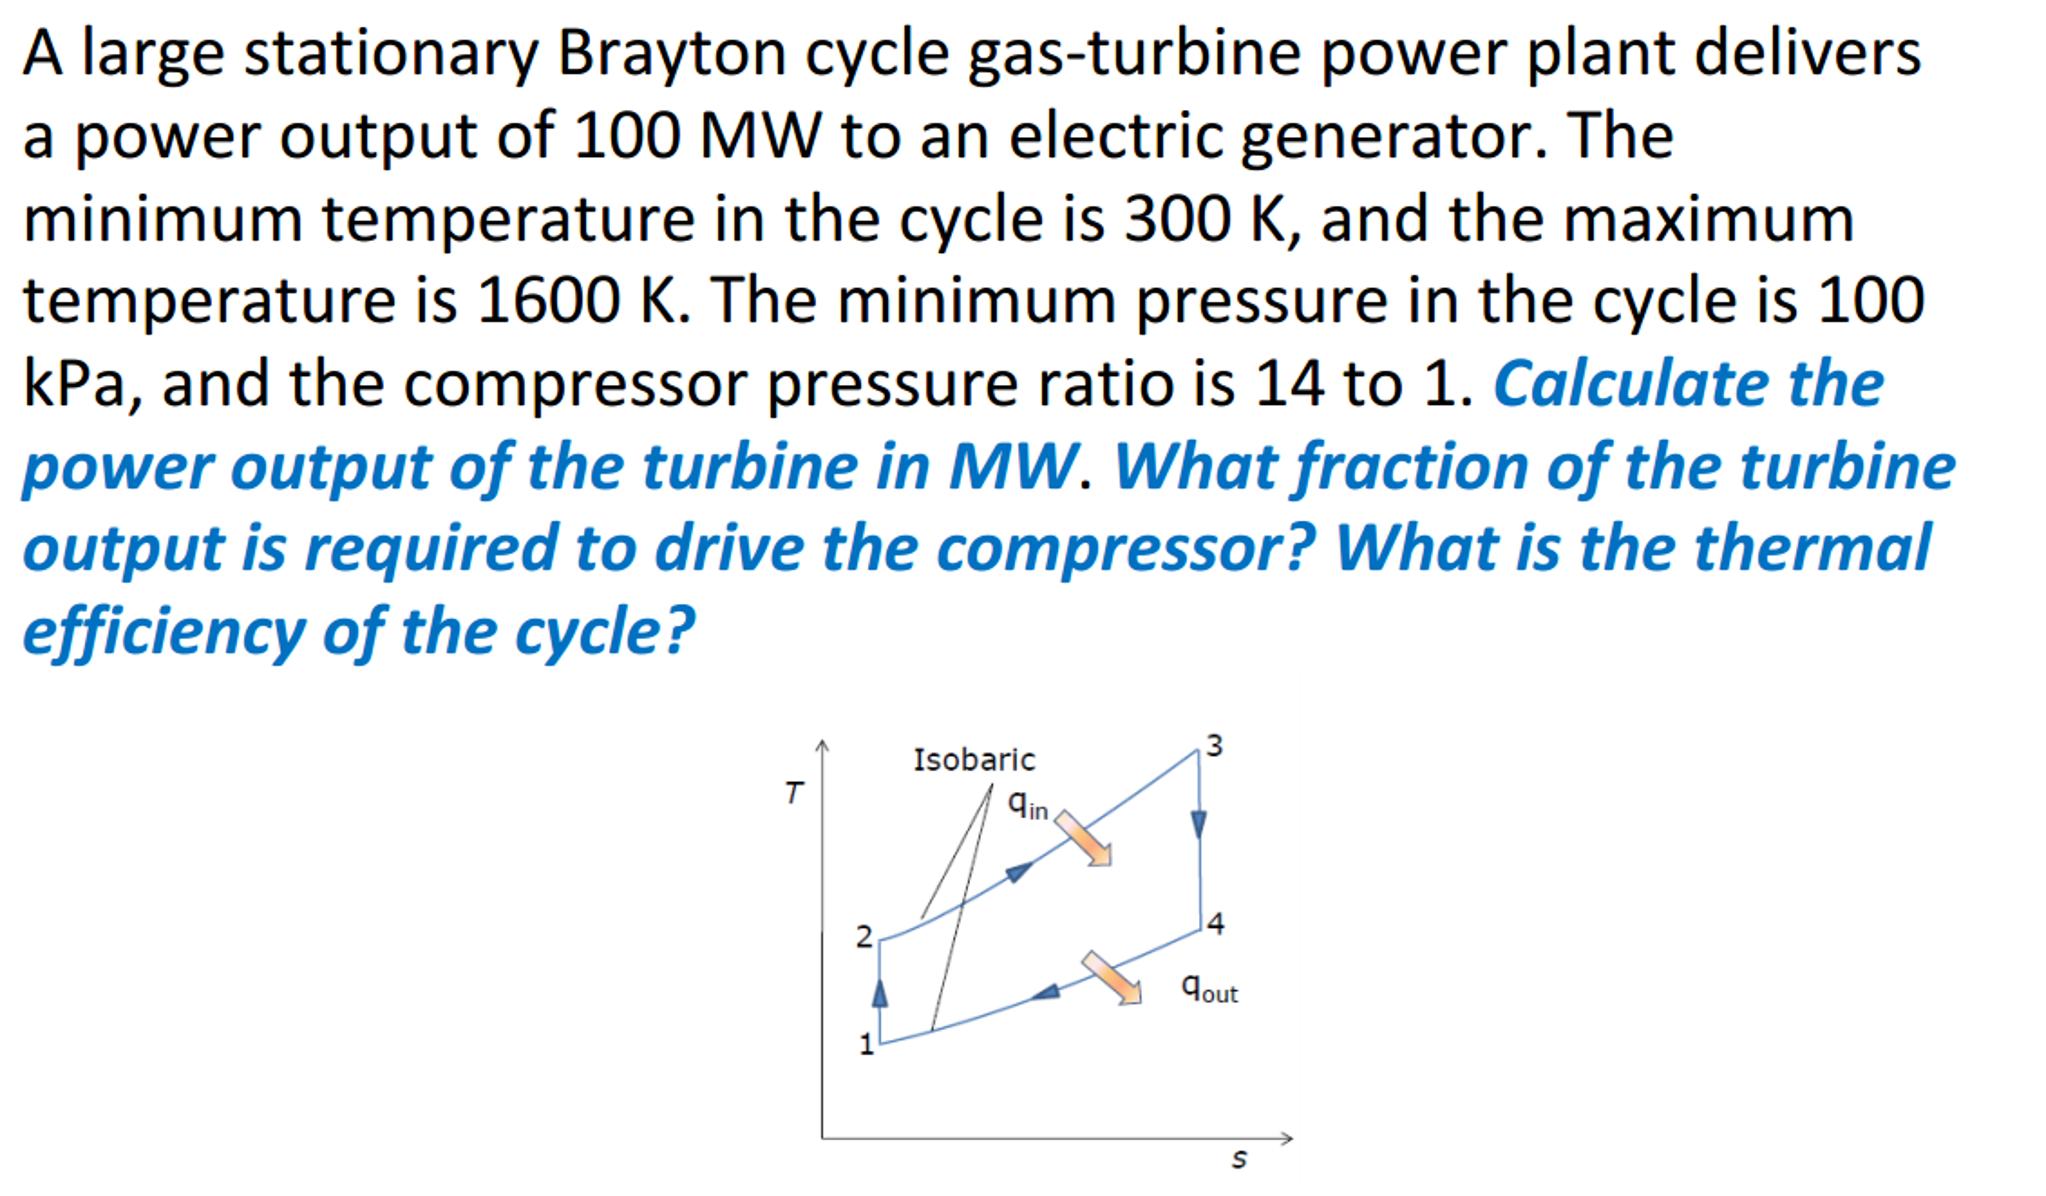 A Stationary Brayton Cycle Gas turbine Power